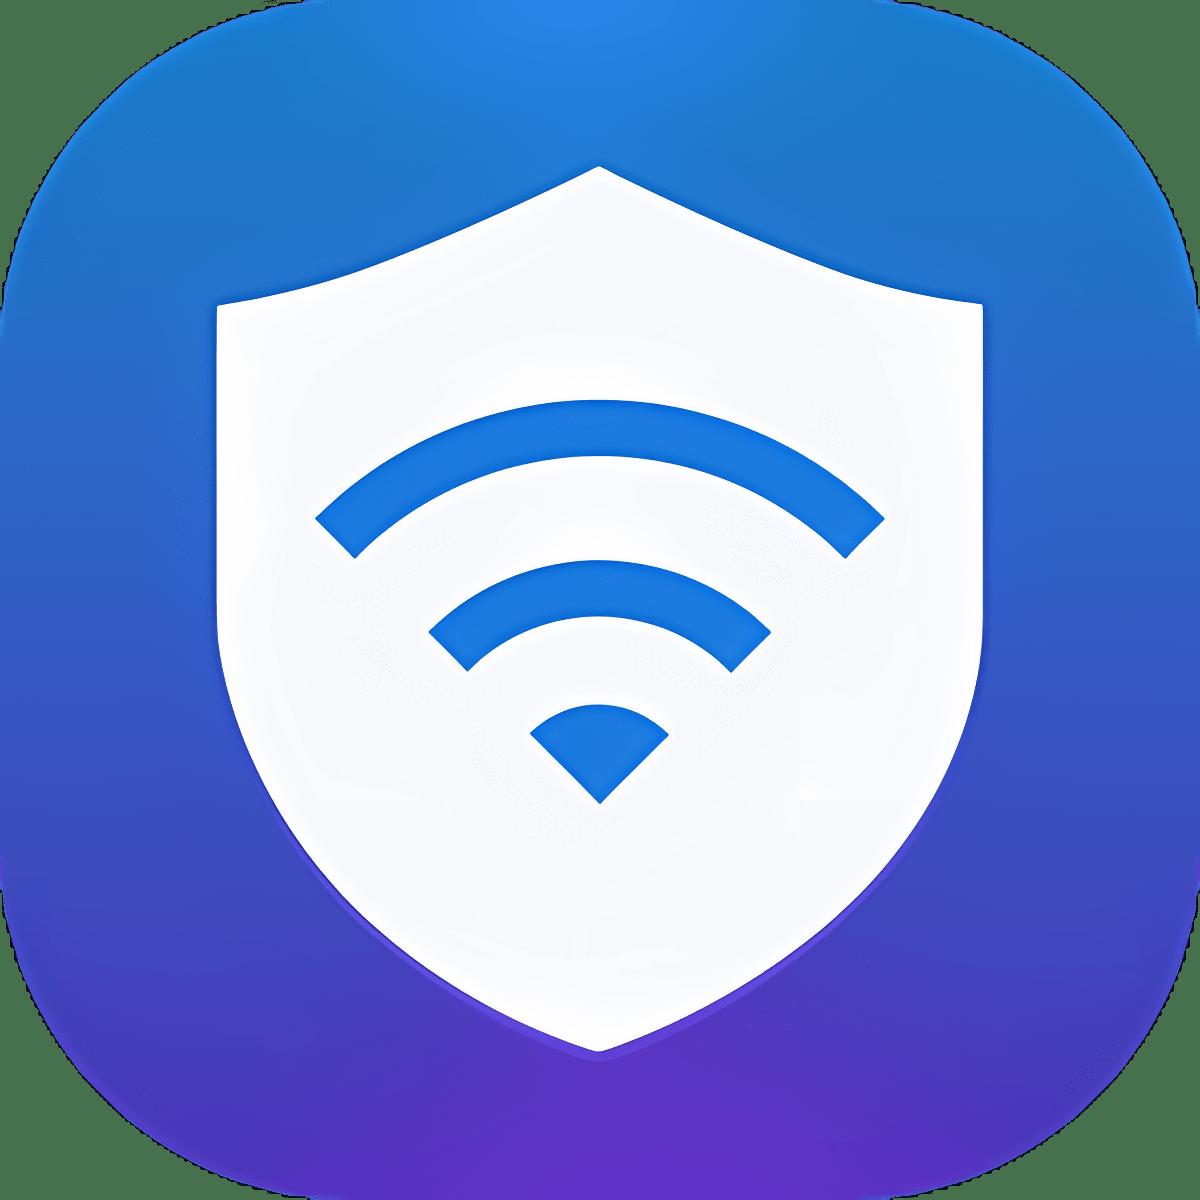 Network Security Pro - Speed test & VPN